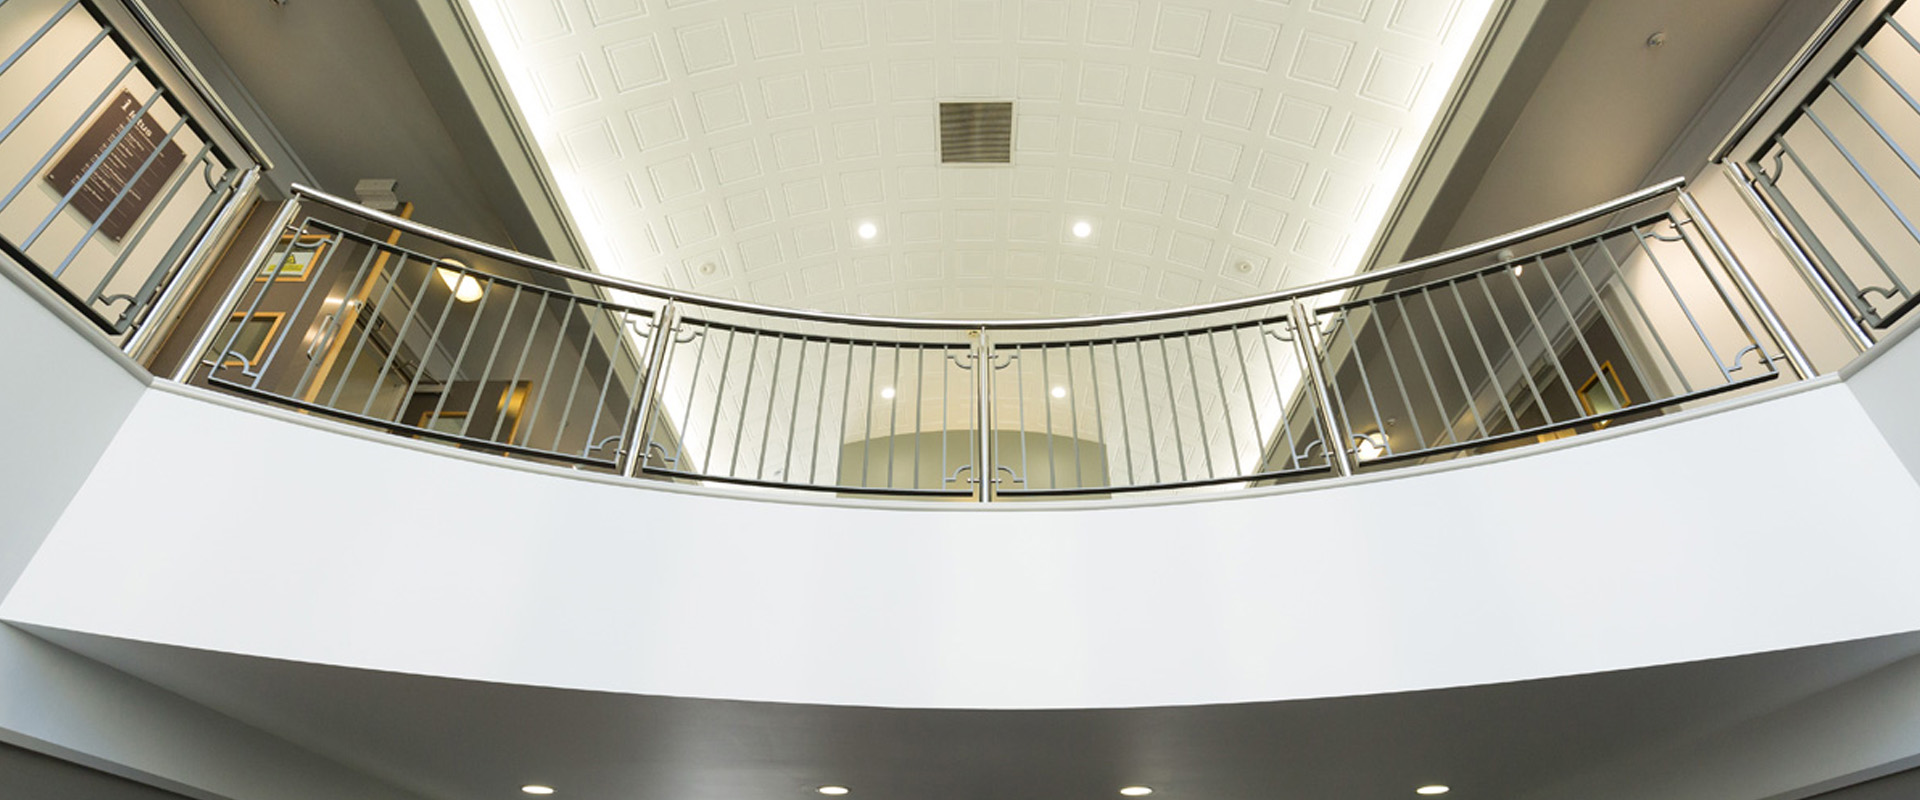 Carus Group Interior Painting at Hospitals